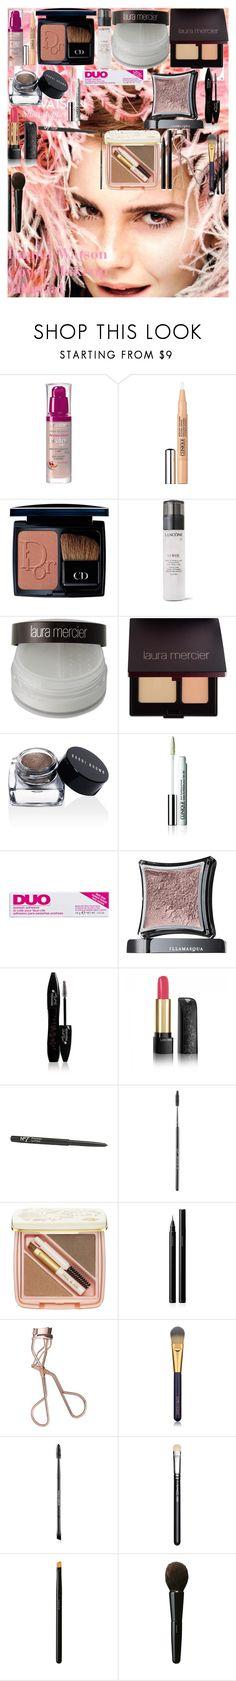 """Emma Watson Cover Makeup Tutorial"" by oroartye-1 on Polyvore featuring beauty, Emma Watson, Bourjois, Clinique, Christian Dior, Lancôme, Laura Mercier, Bobbi Brown Cosmetics, DUO and Illamasqua"